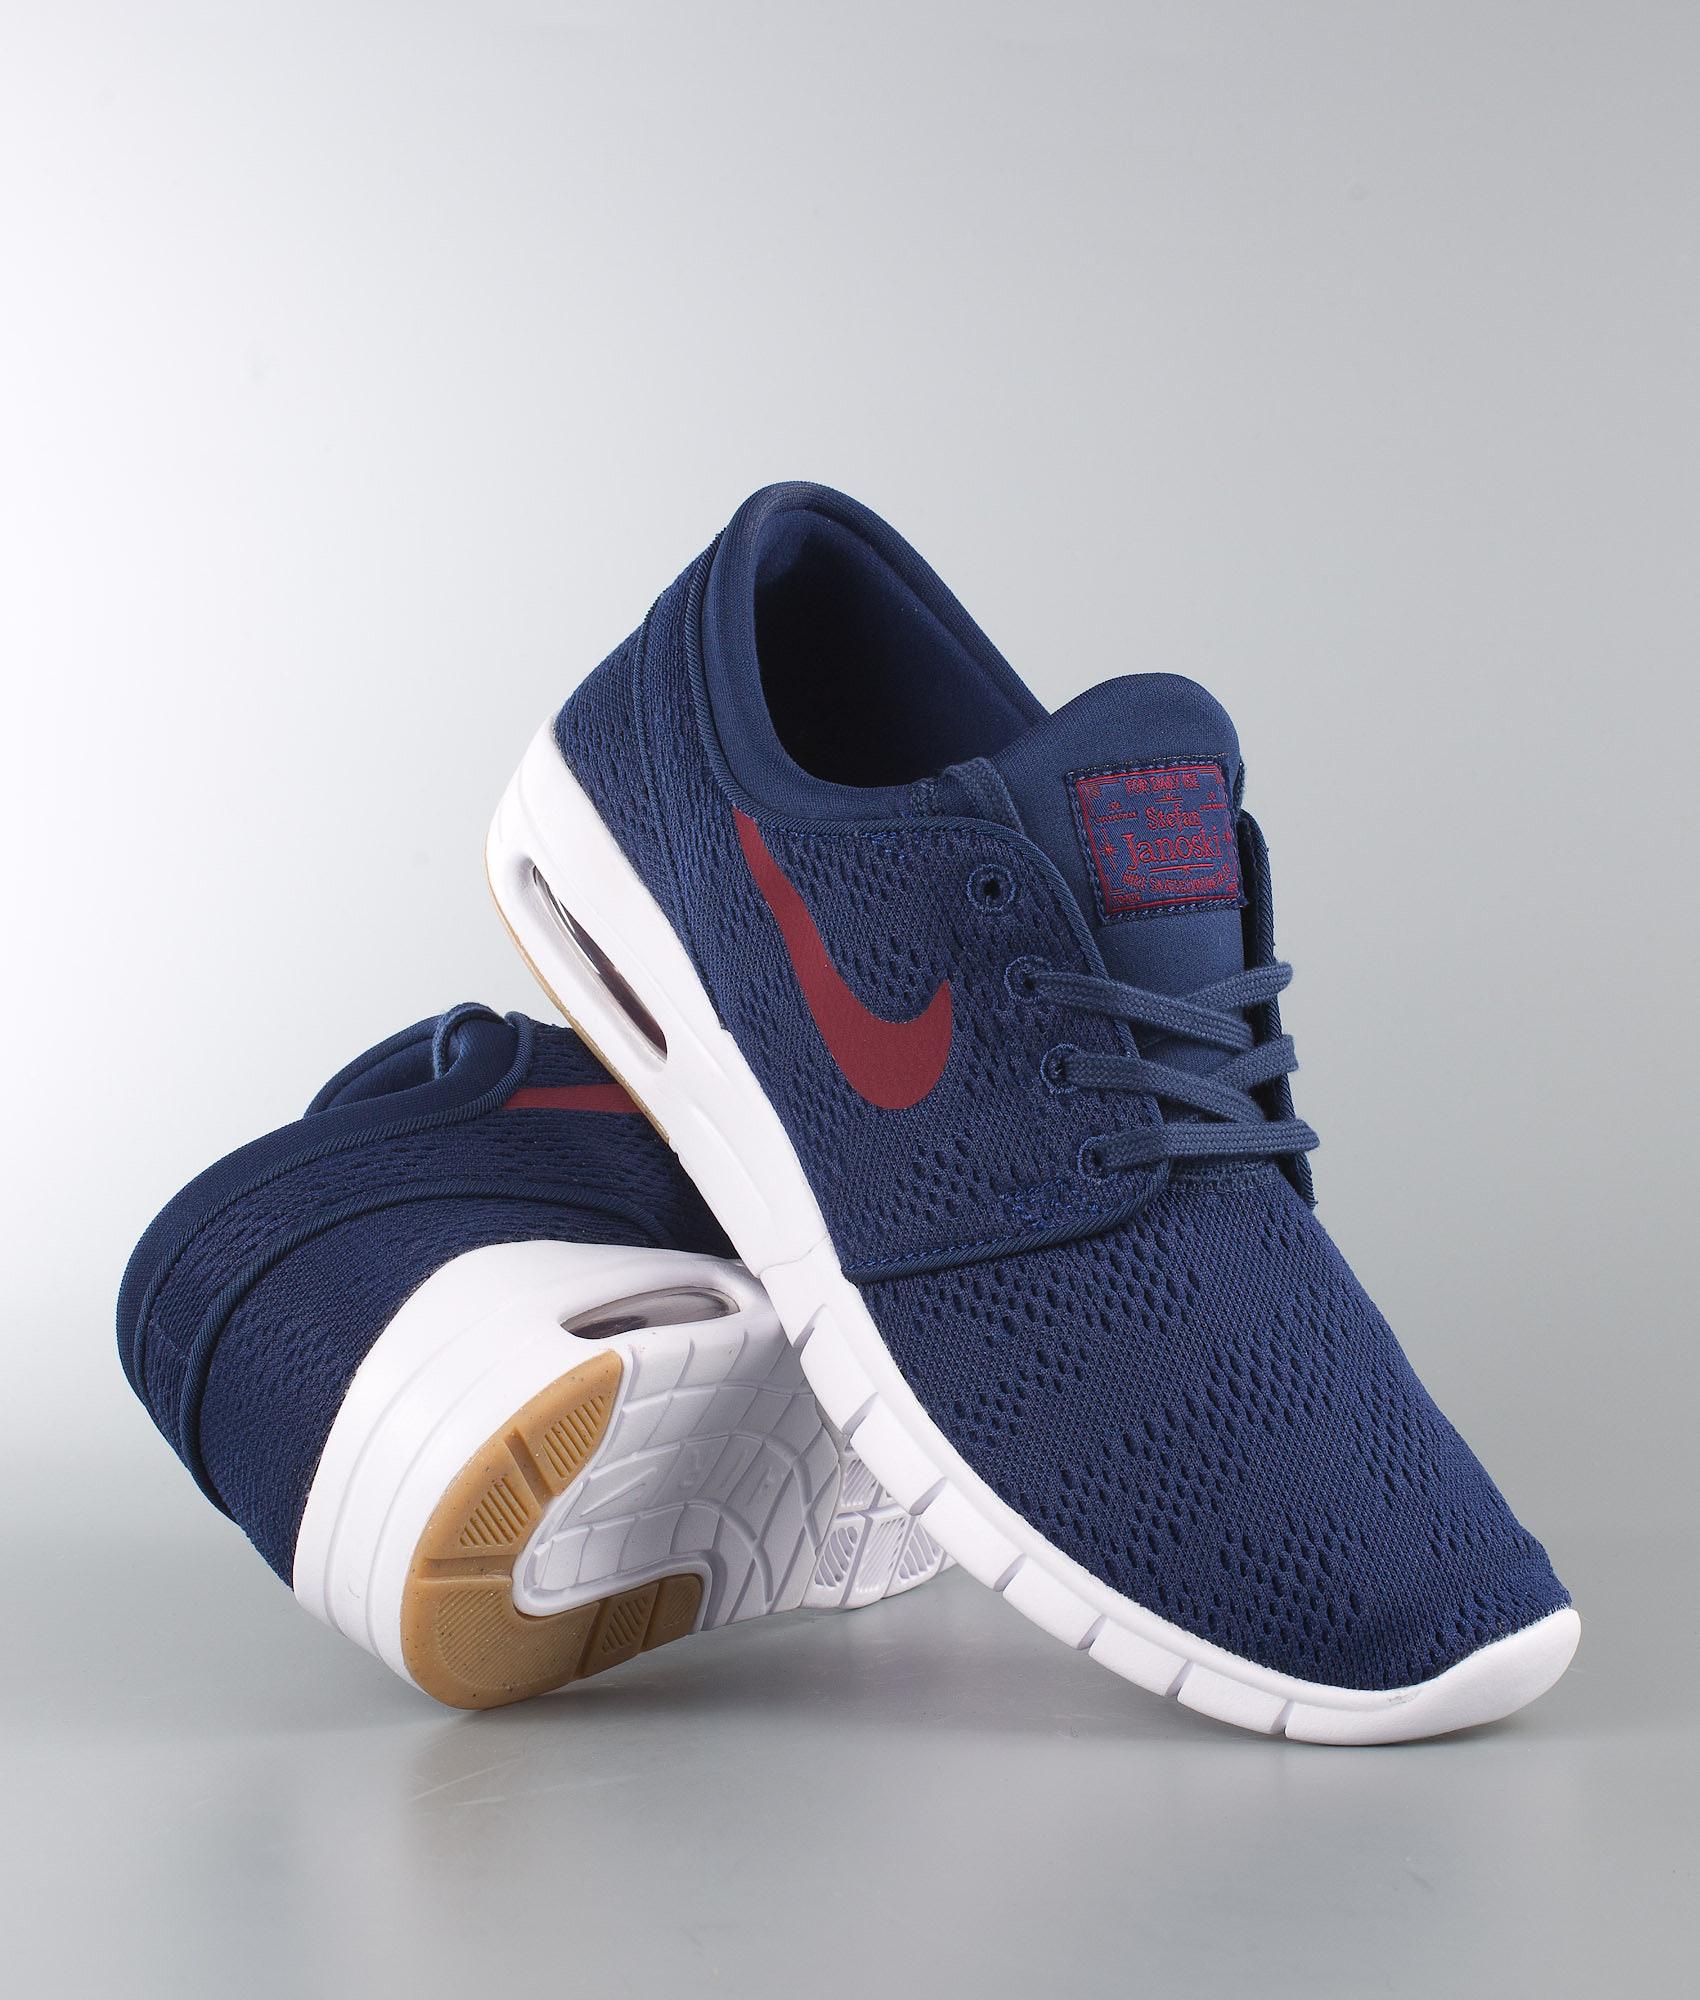 5b8736810f Nike Stefan Janoski Max Shoes Binary Blue/Team Red-Gum Light Brown ...